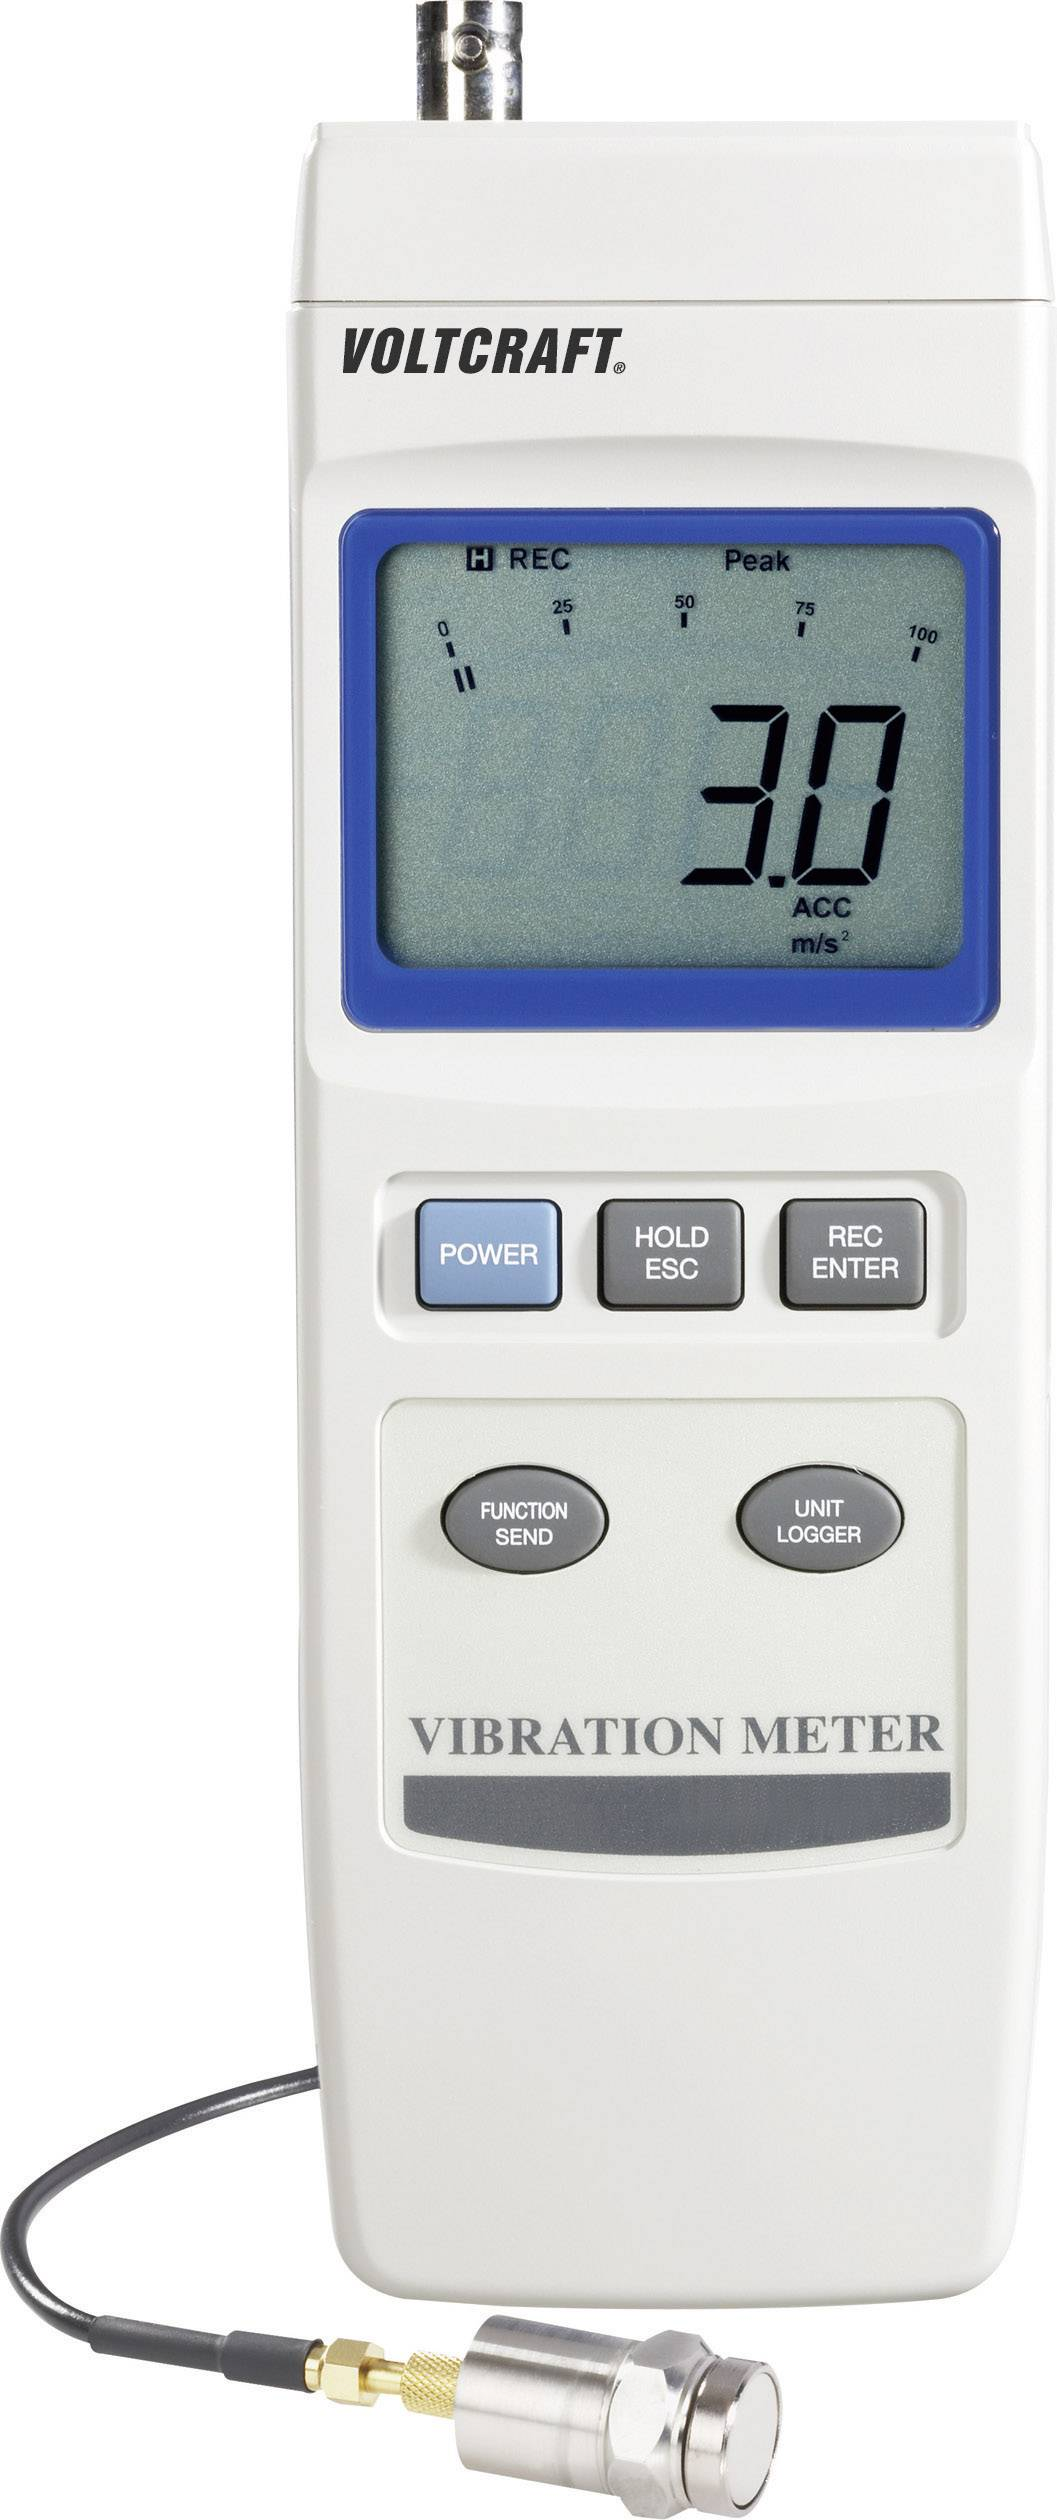 Merač vibrácií VOLTCRAFT VBM-100